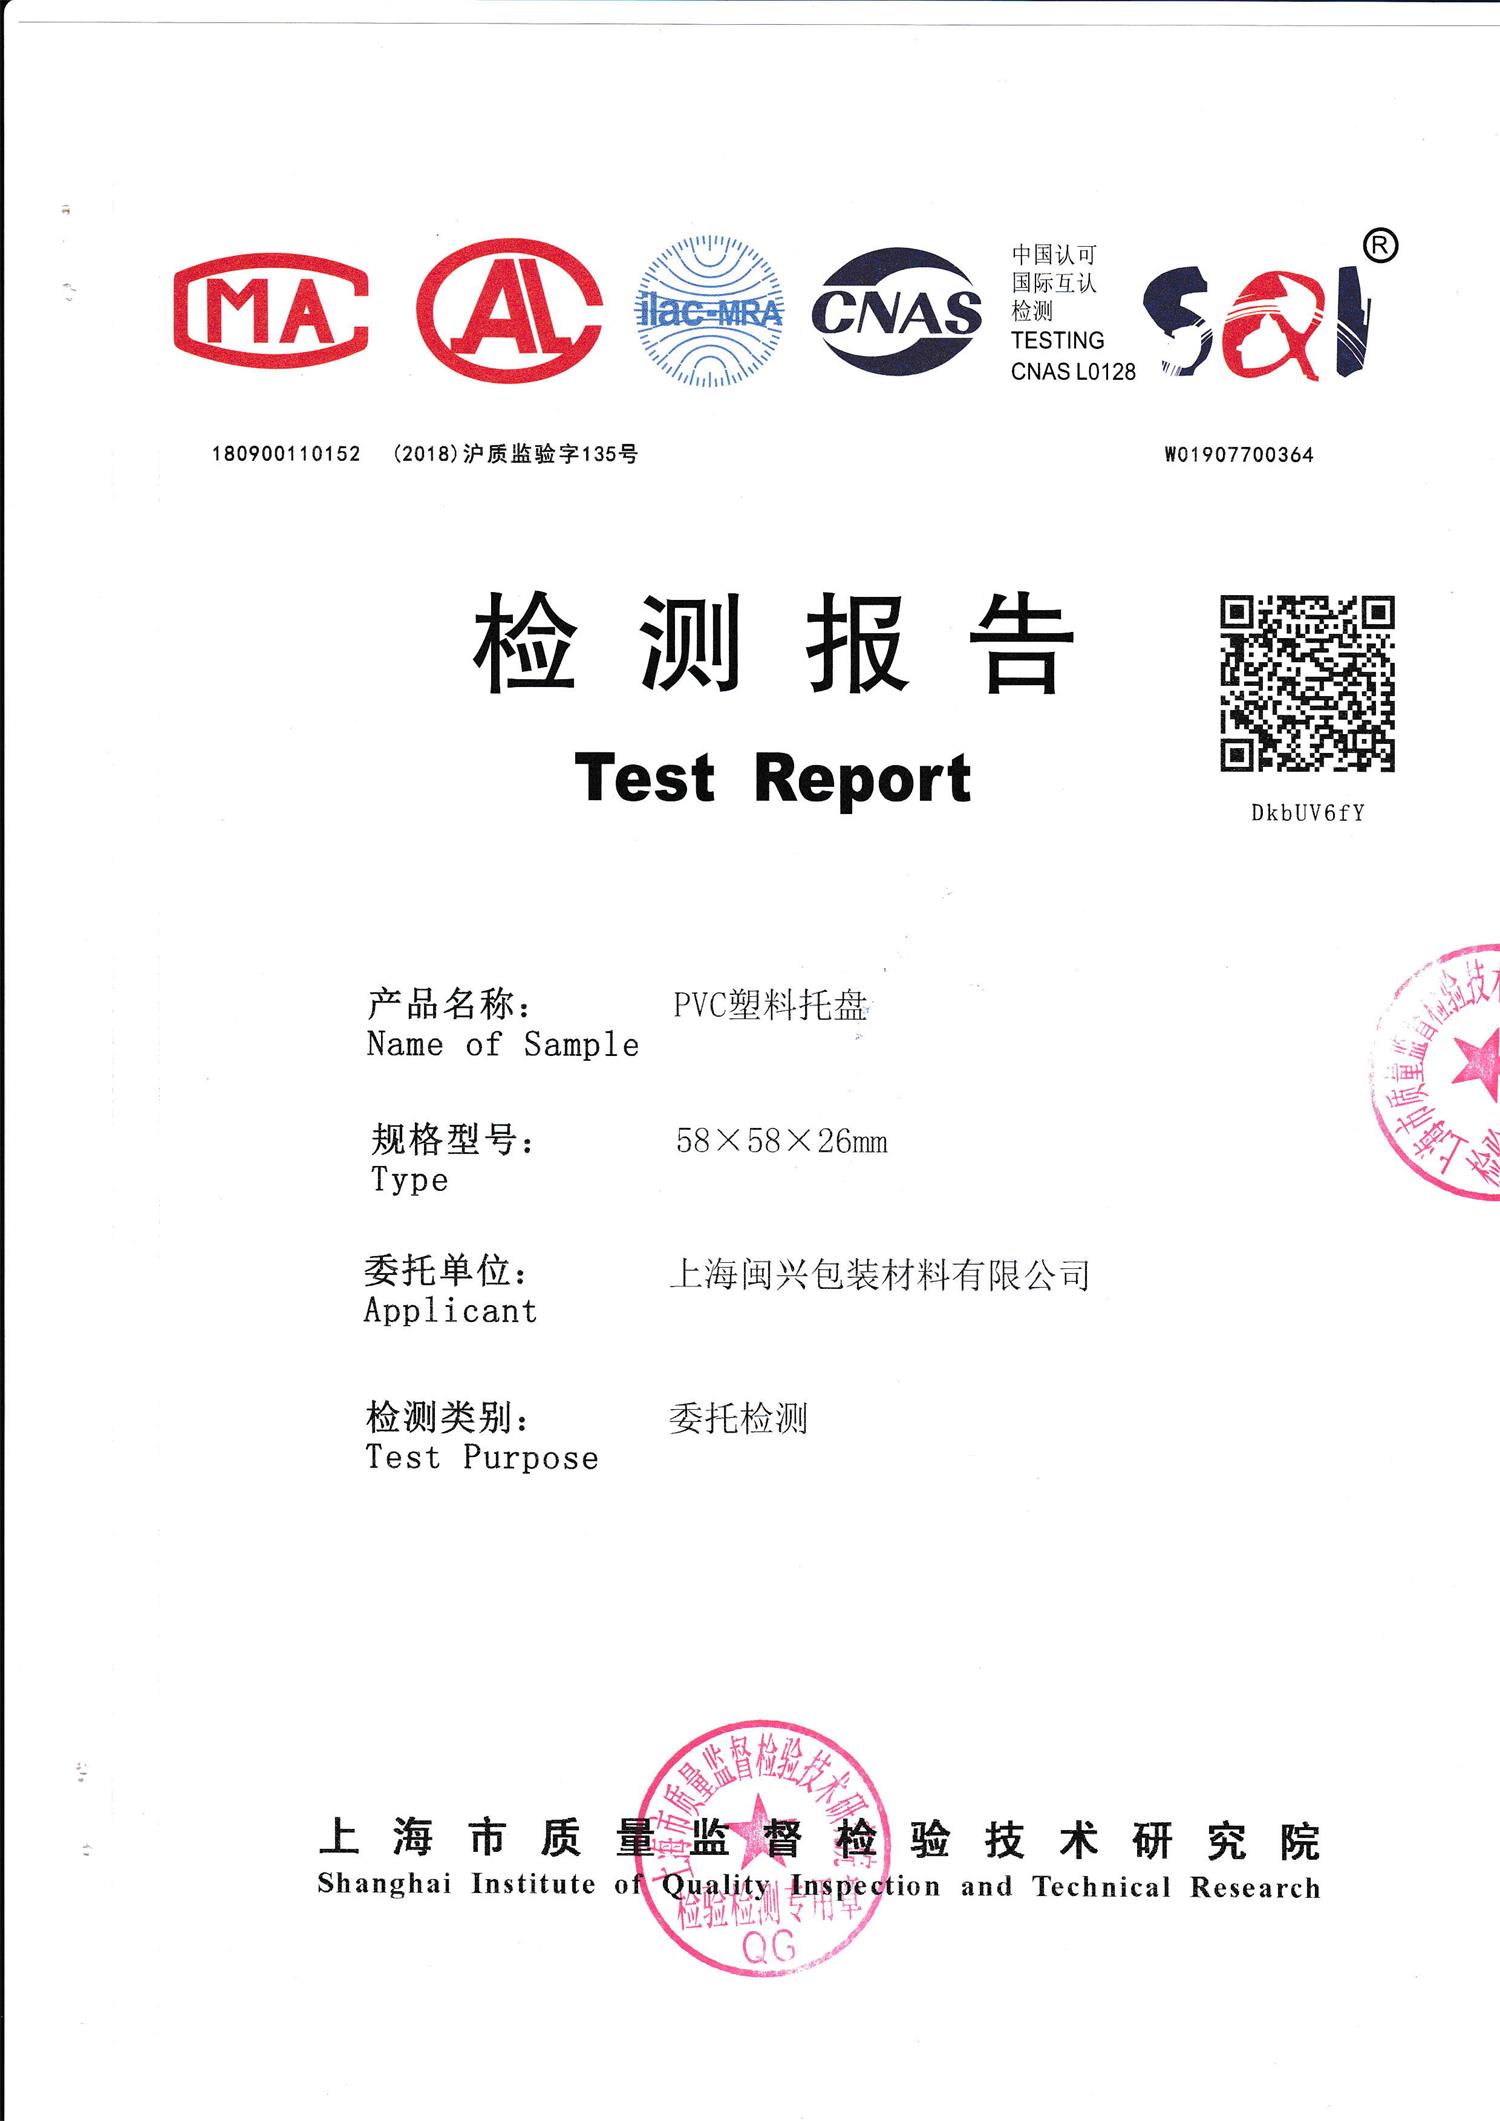 PVC检测报告